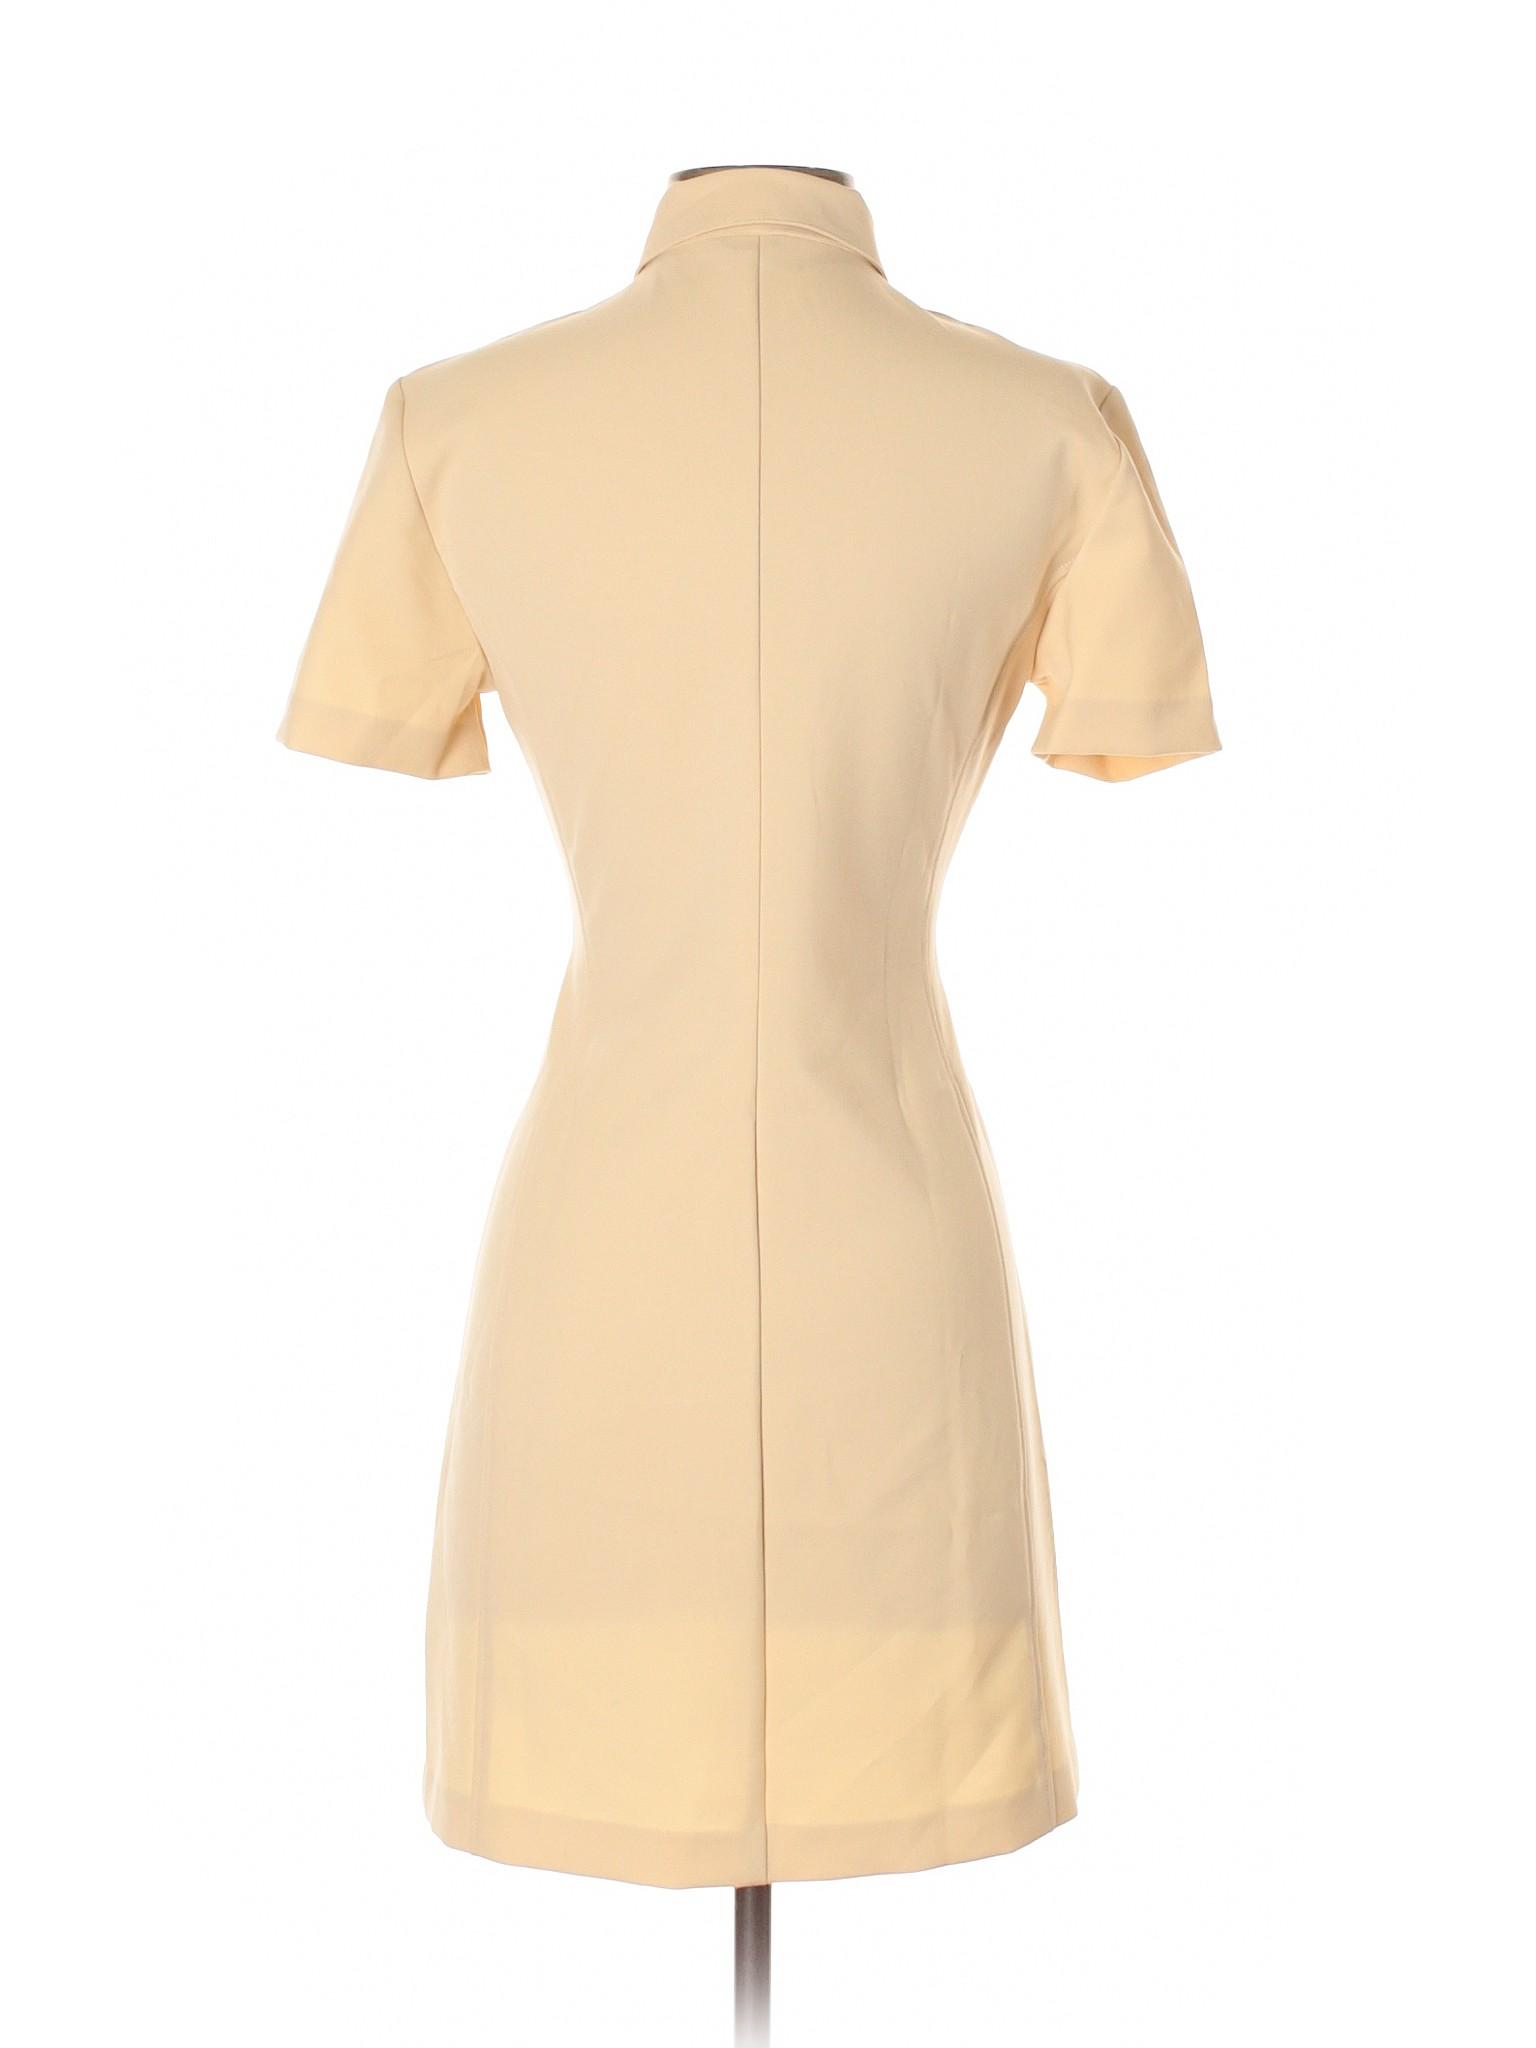 United Benetton Colors winter Dress Casual Of Boutique 5wqUAPx